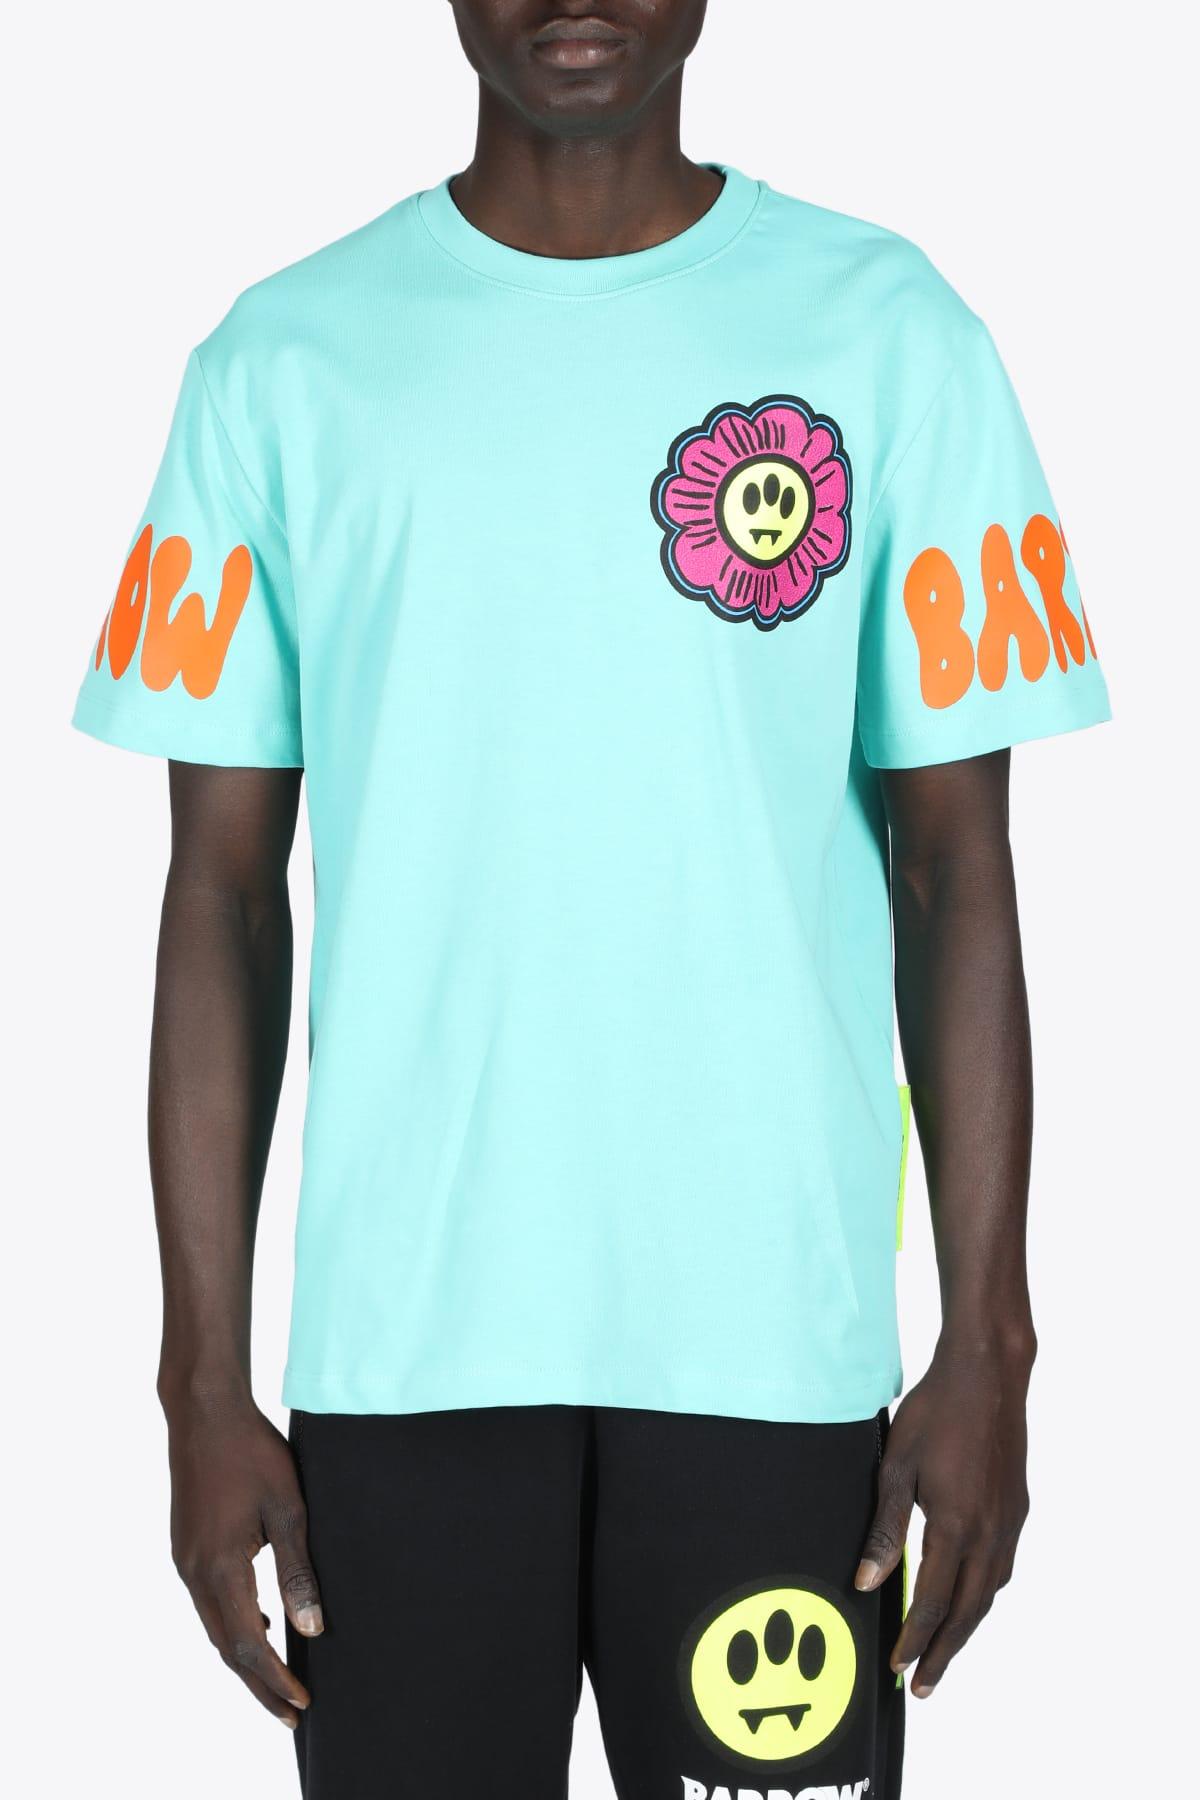 Barrow T-shirts FLOWER SMILE TEE